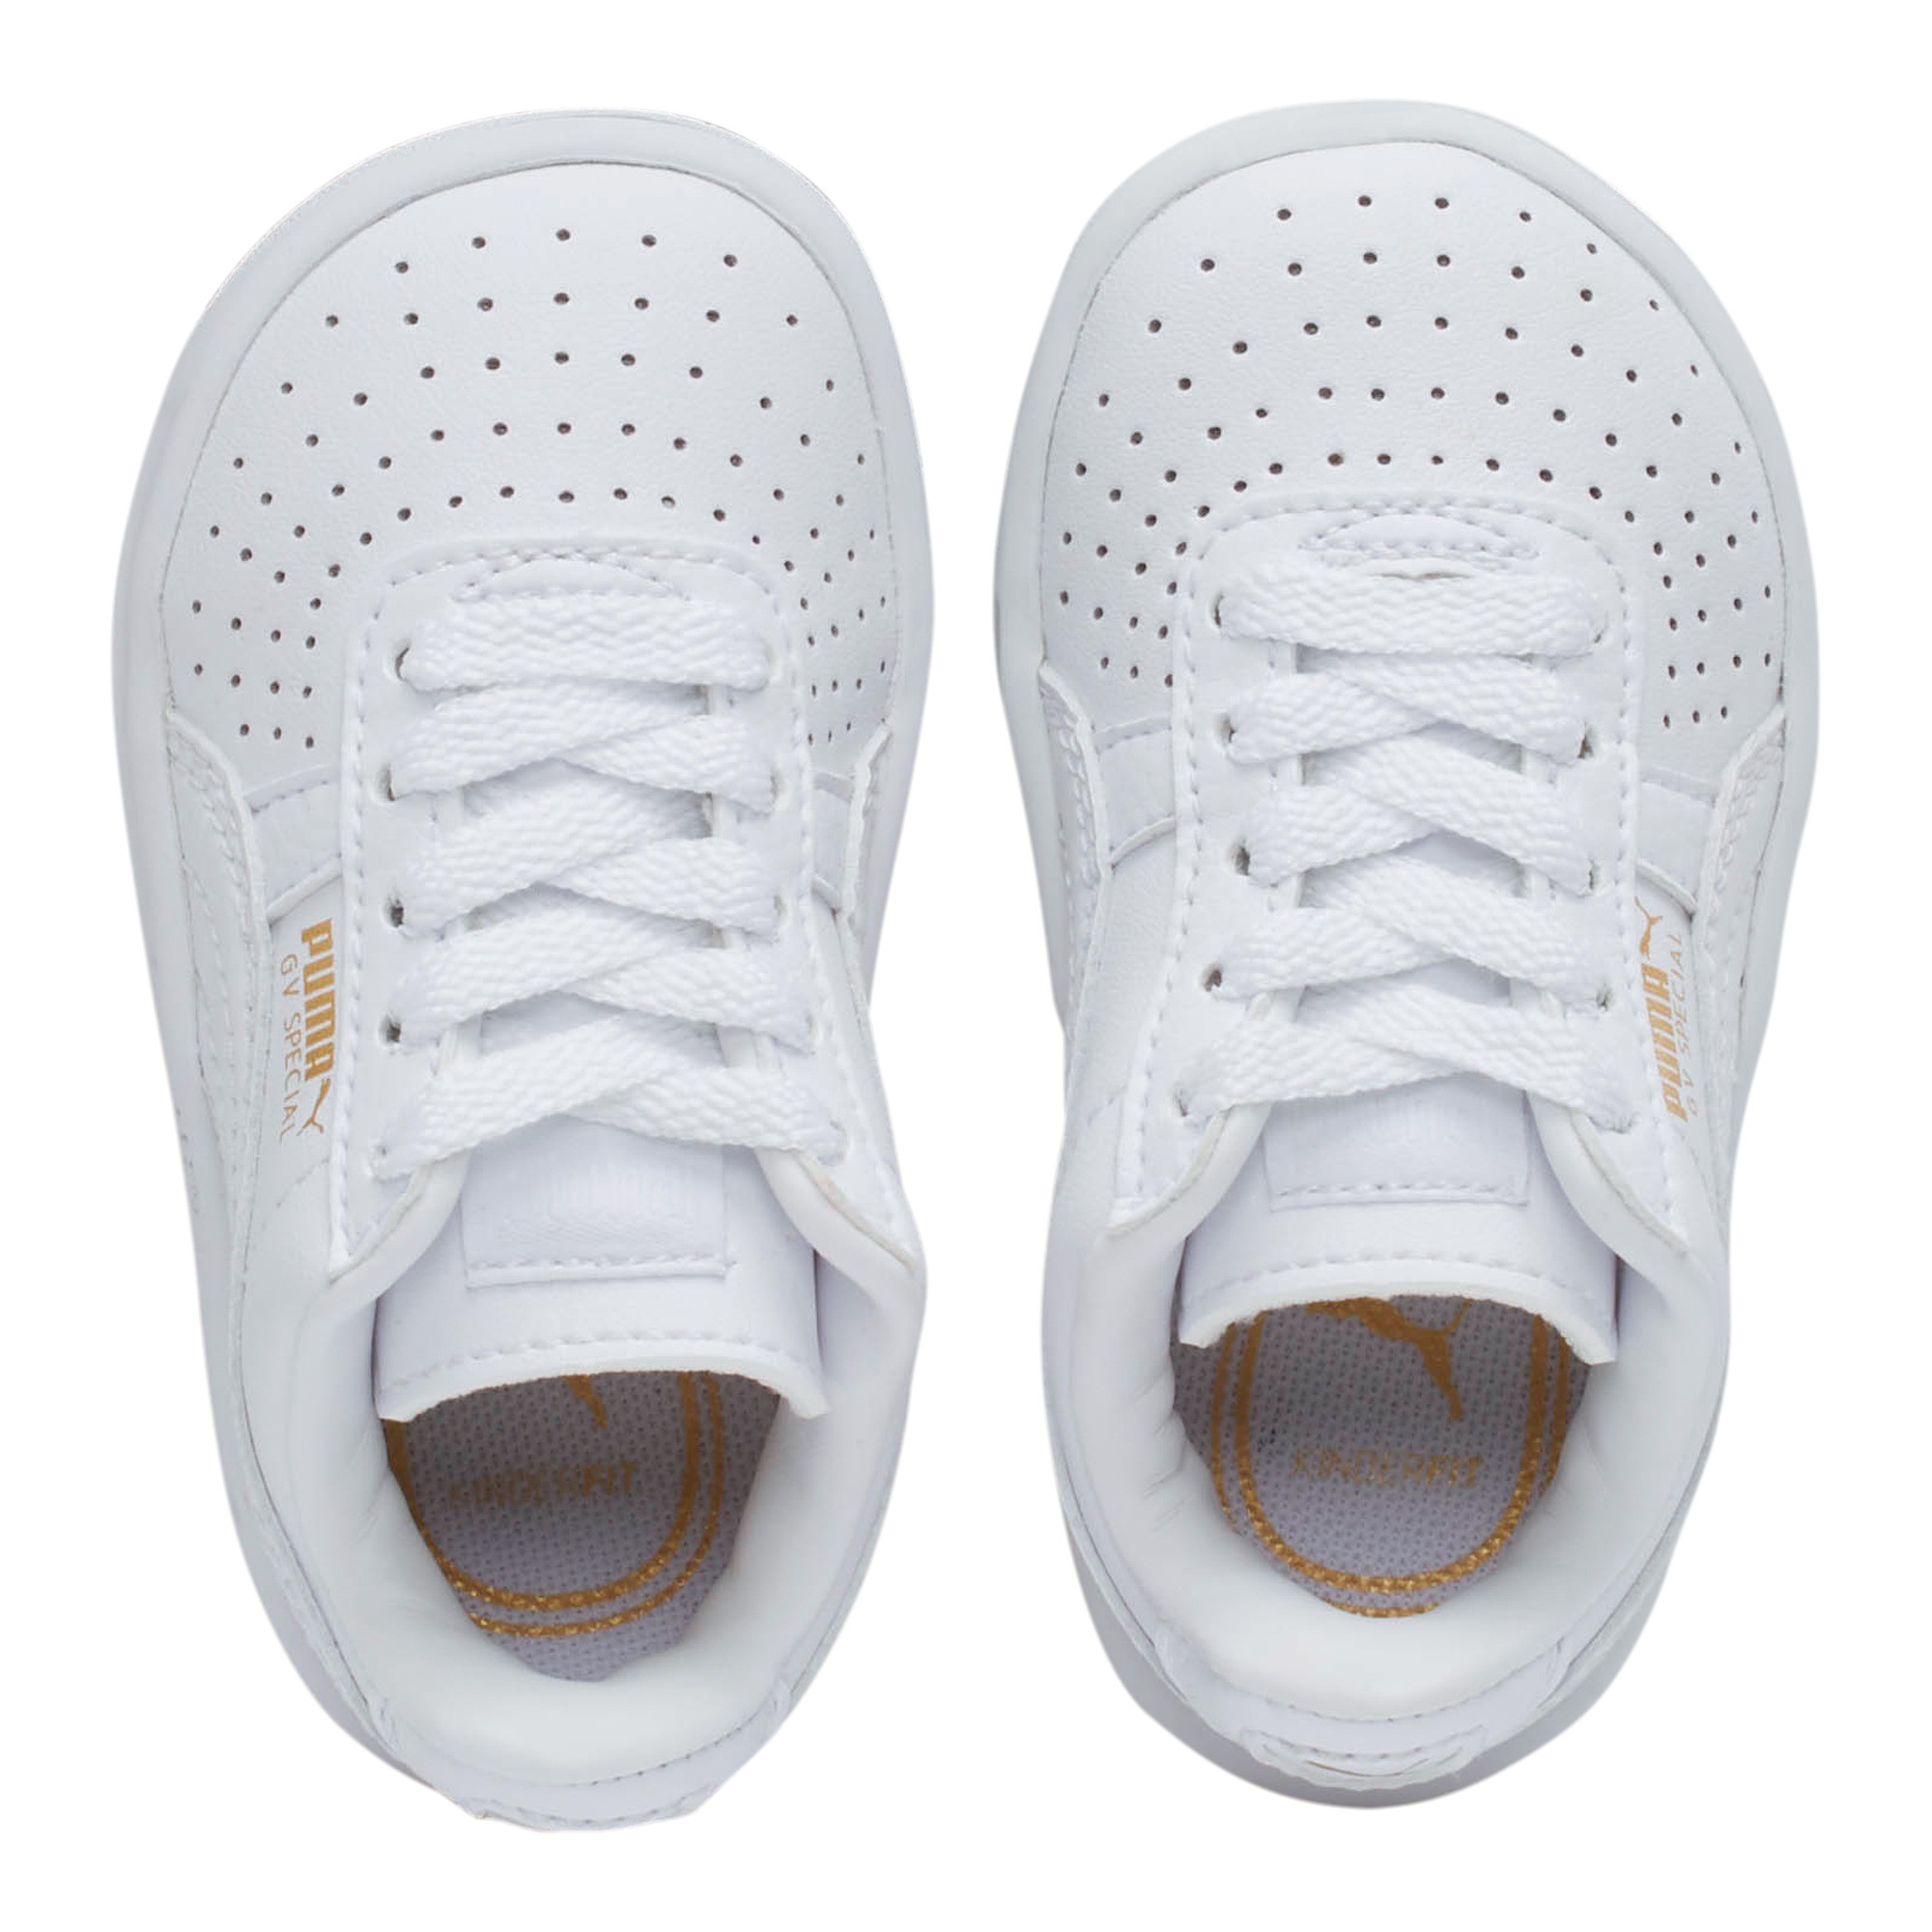 PUMA-Infant-GV-Special-Shoes thumbnail 18